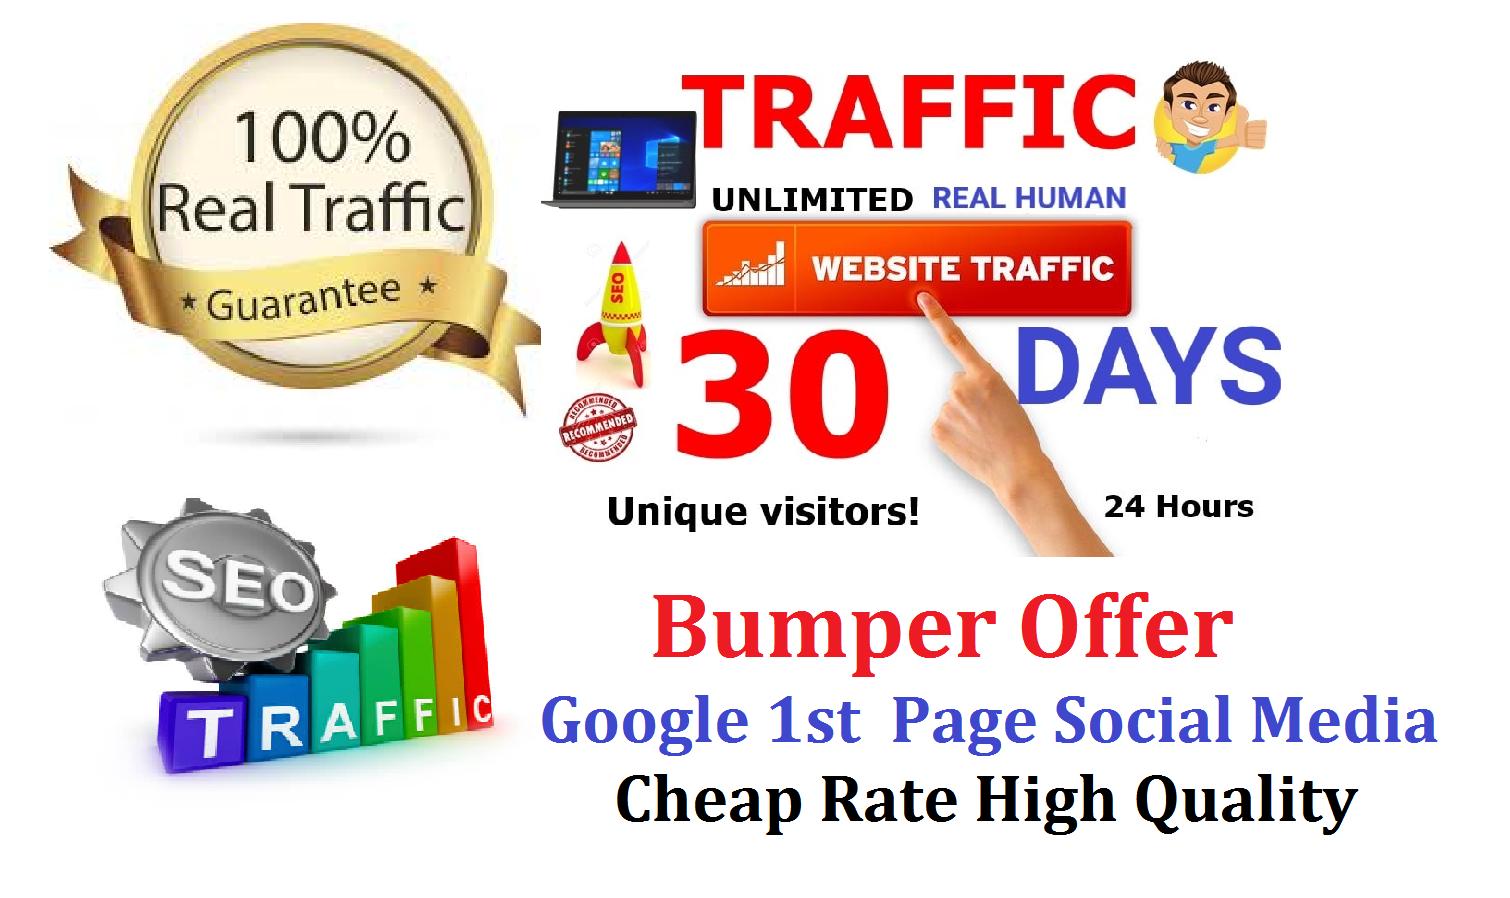 Bumper Offer 300,000 Worldwide Website USA Real Traffic Instagram, YouTube, Twitter, LinkedIn Traffic